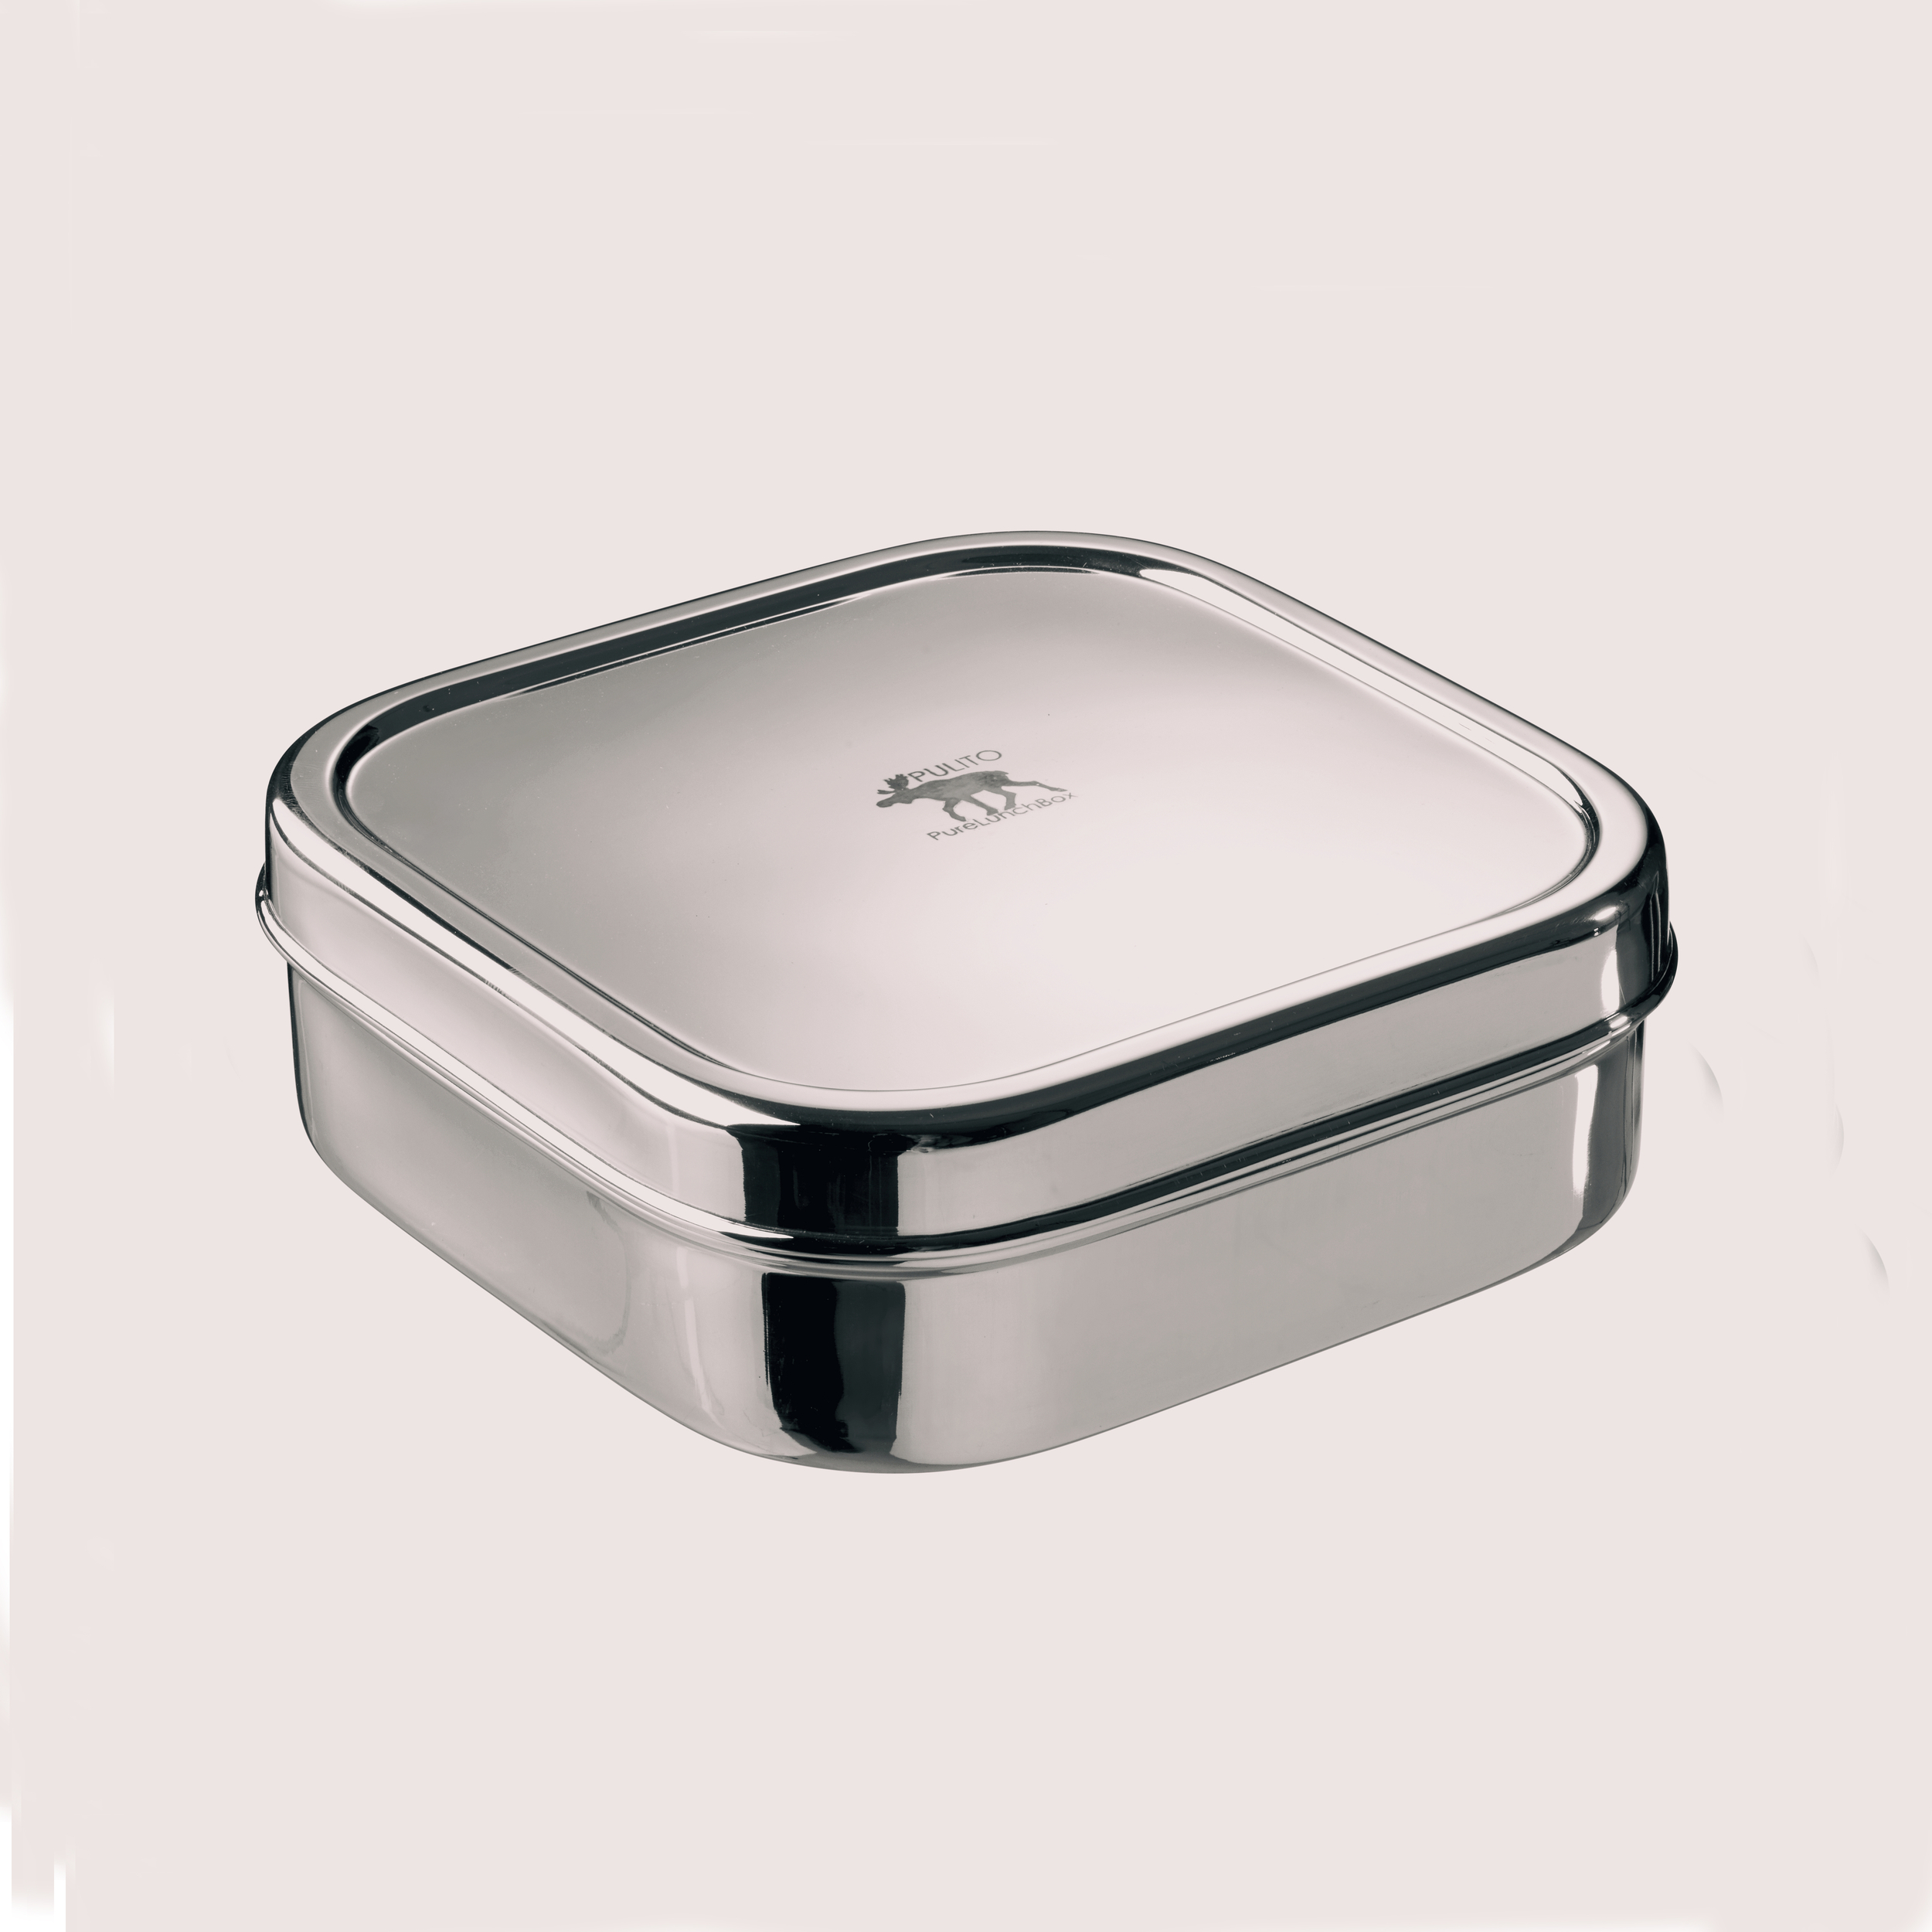 Boîte à goûter lunchbox en inox carrée